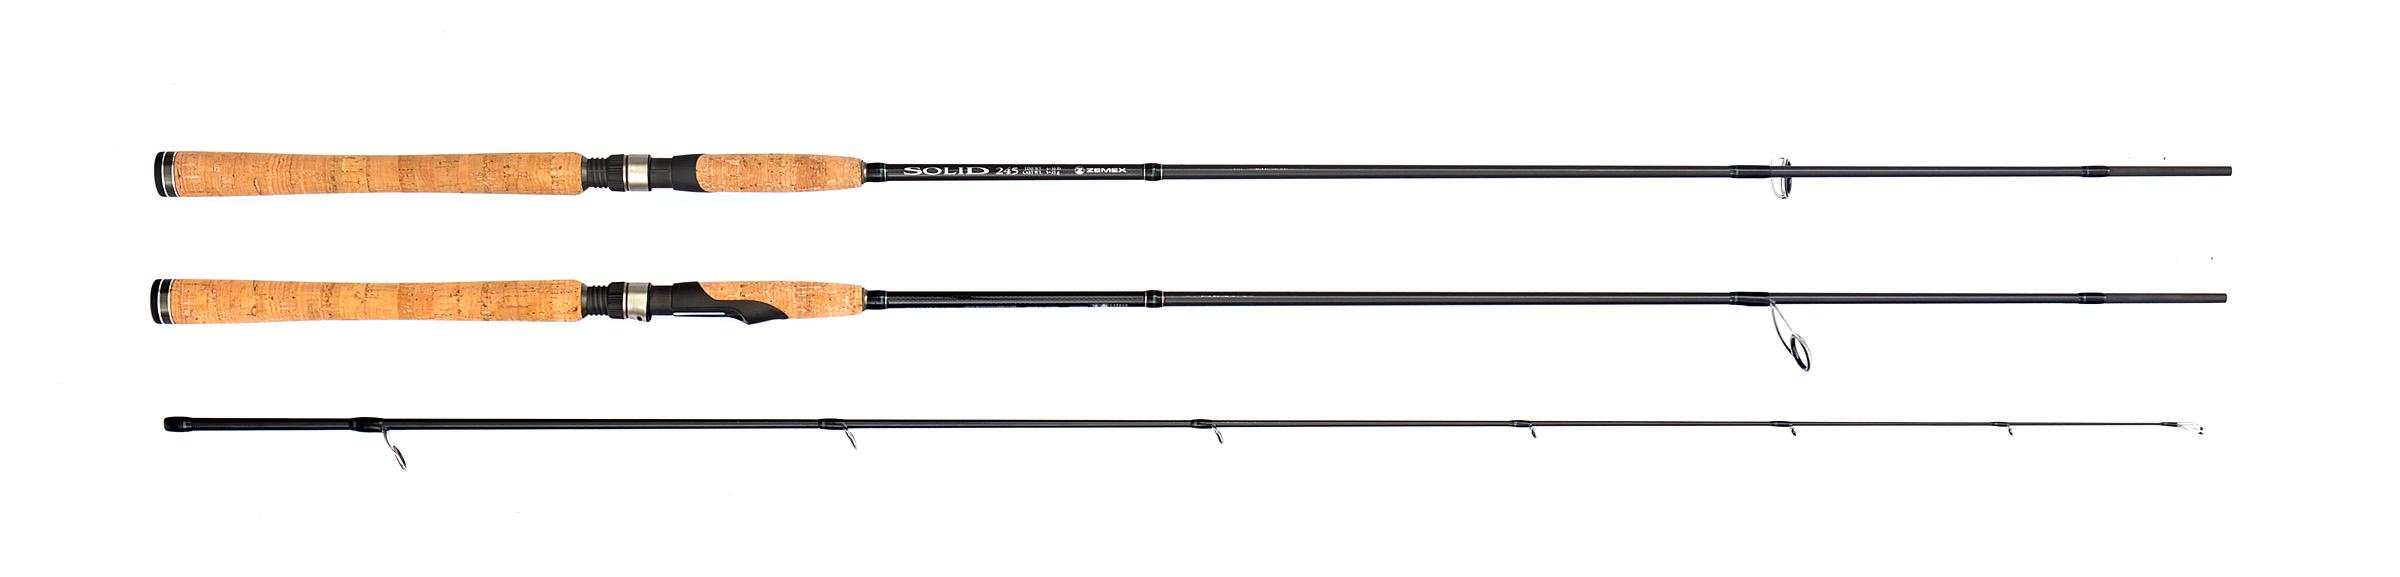 Спиннинг Zemex Solid 2,25м 3-12гр